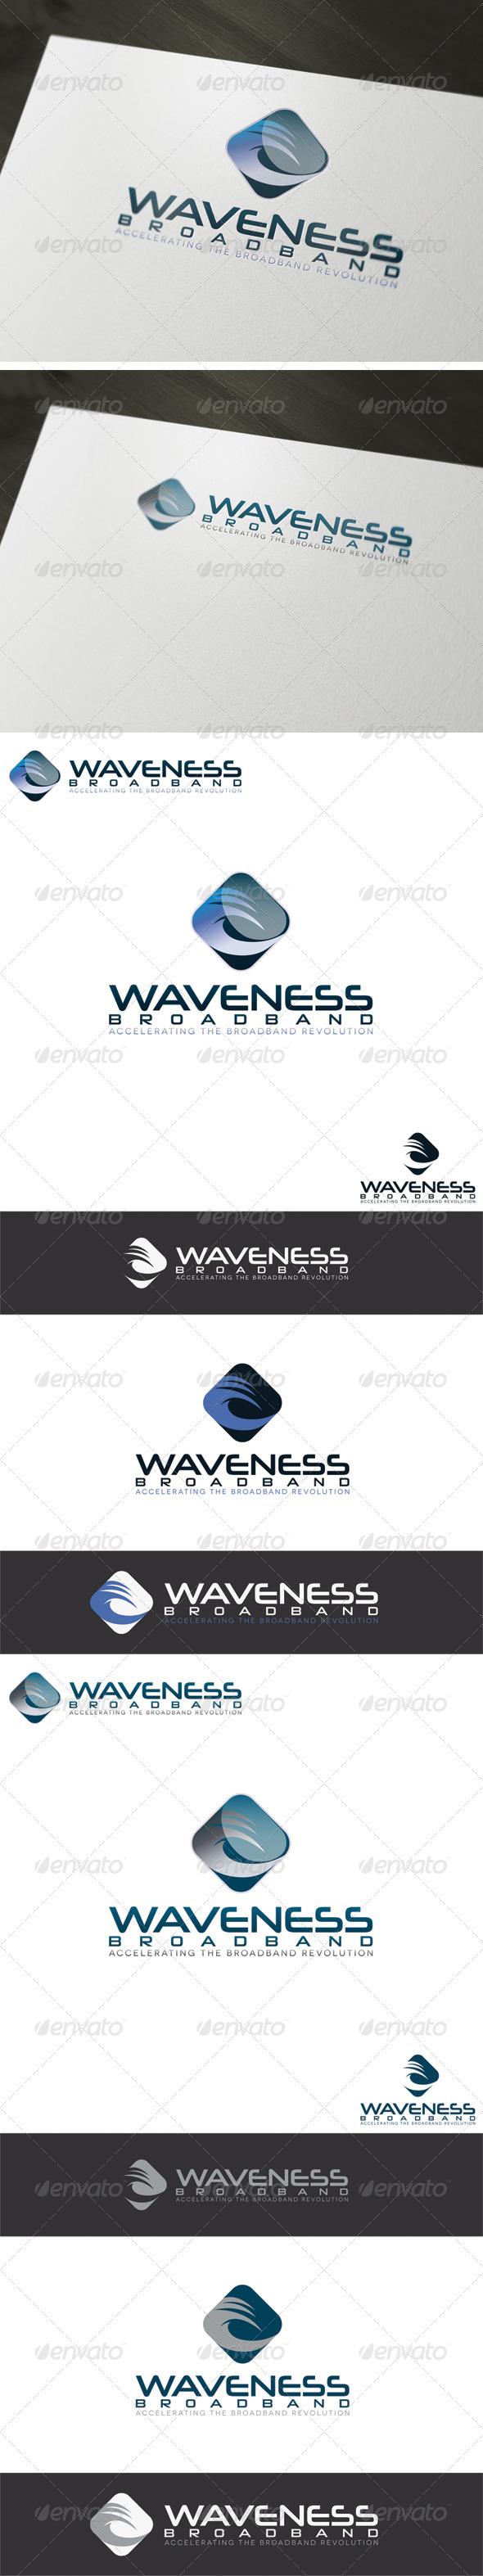 Broadband Logo Template - Vector Abstract